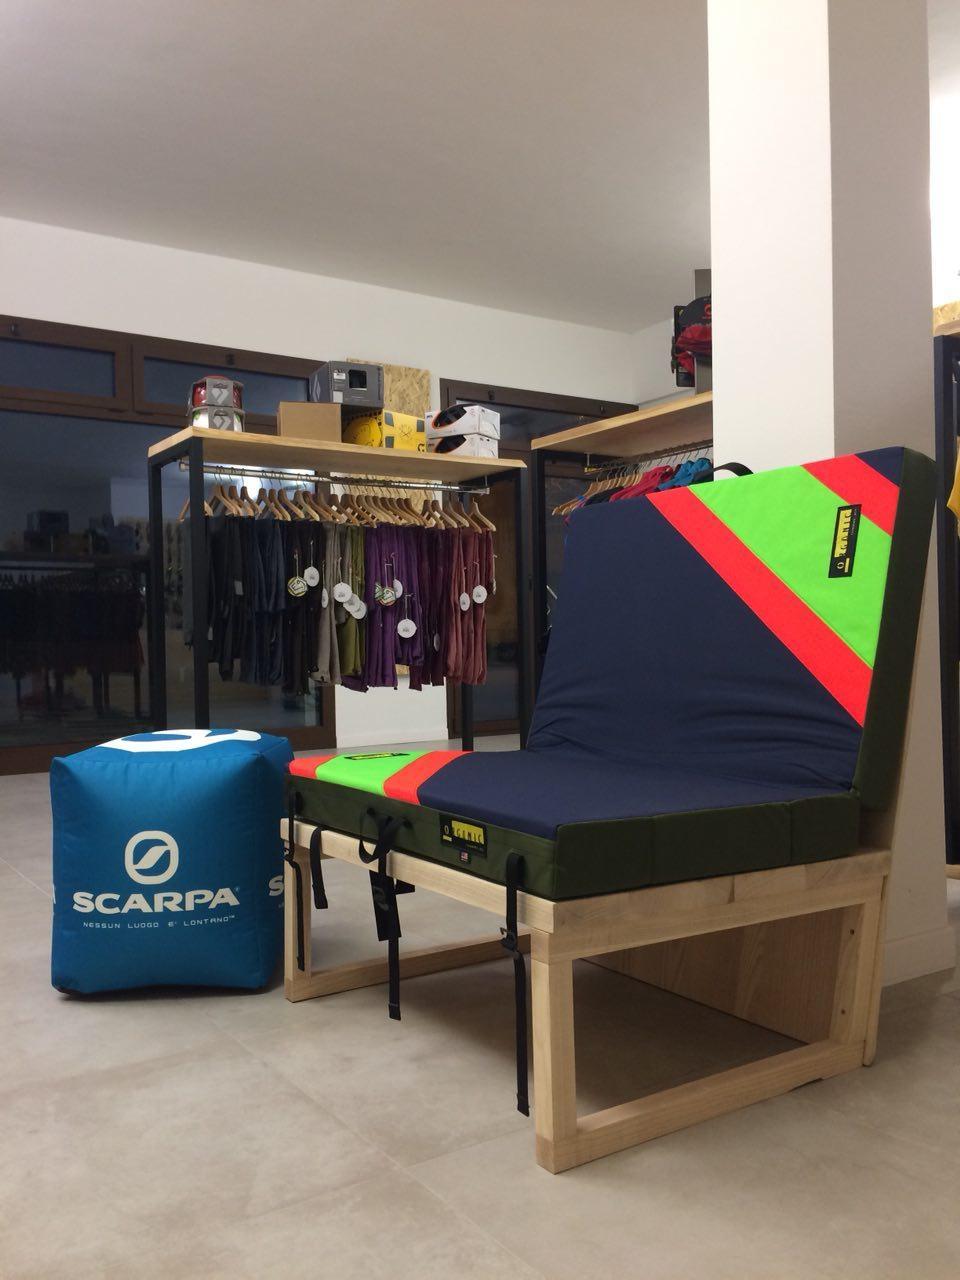 Crash pad Organic negozio arrampicata Padova. Negozio arrampicata Padova  Oliunìd ab976e6a344e